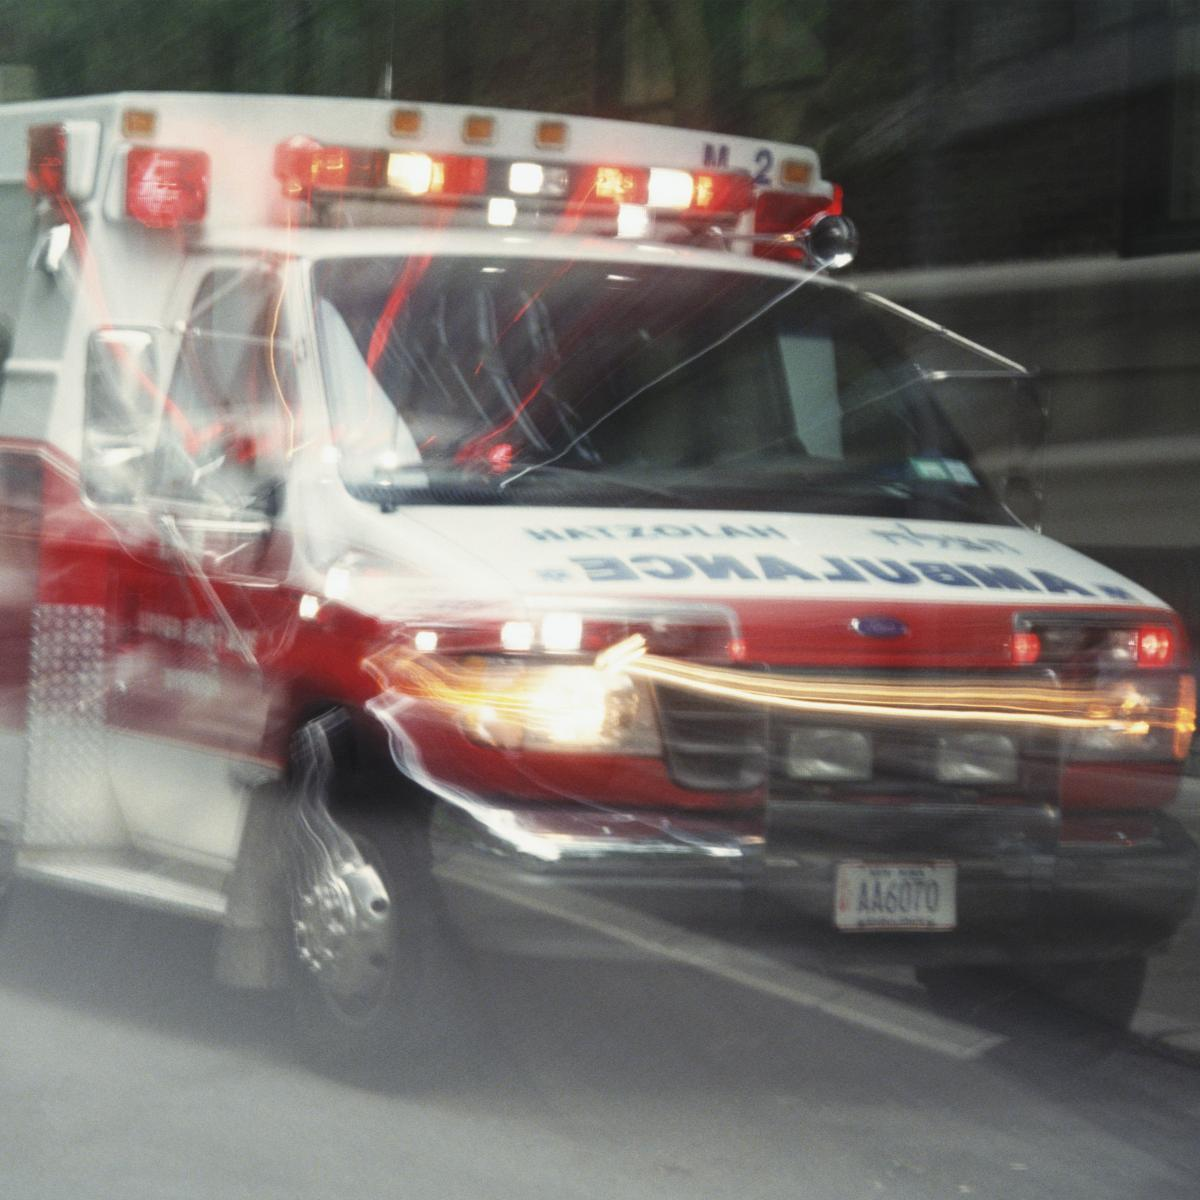 Blurred Ambulance